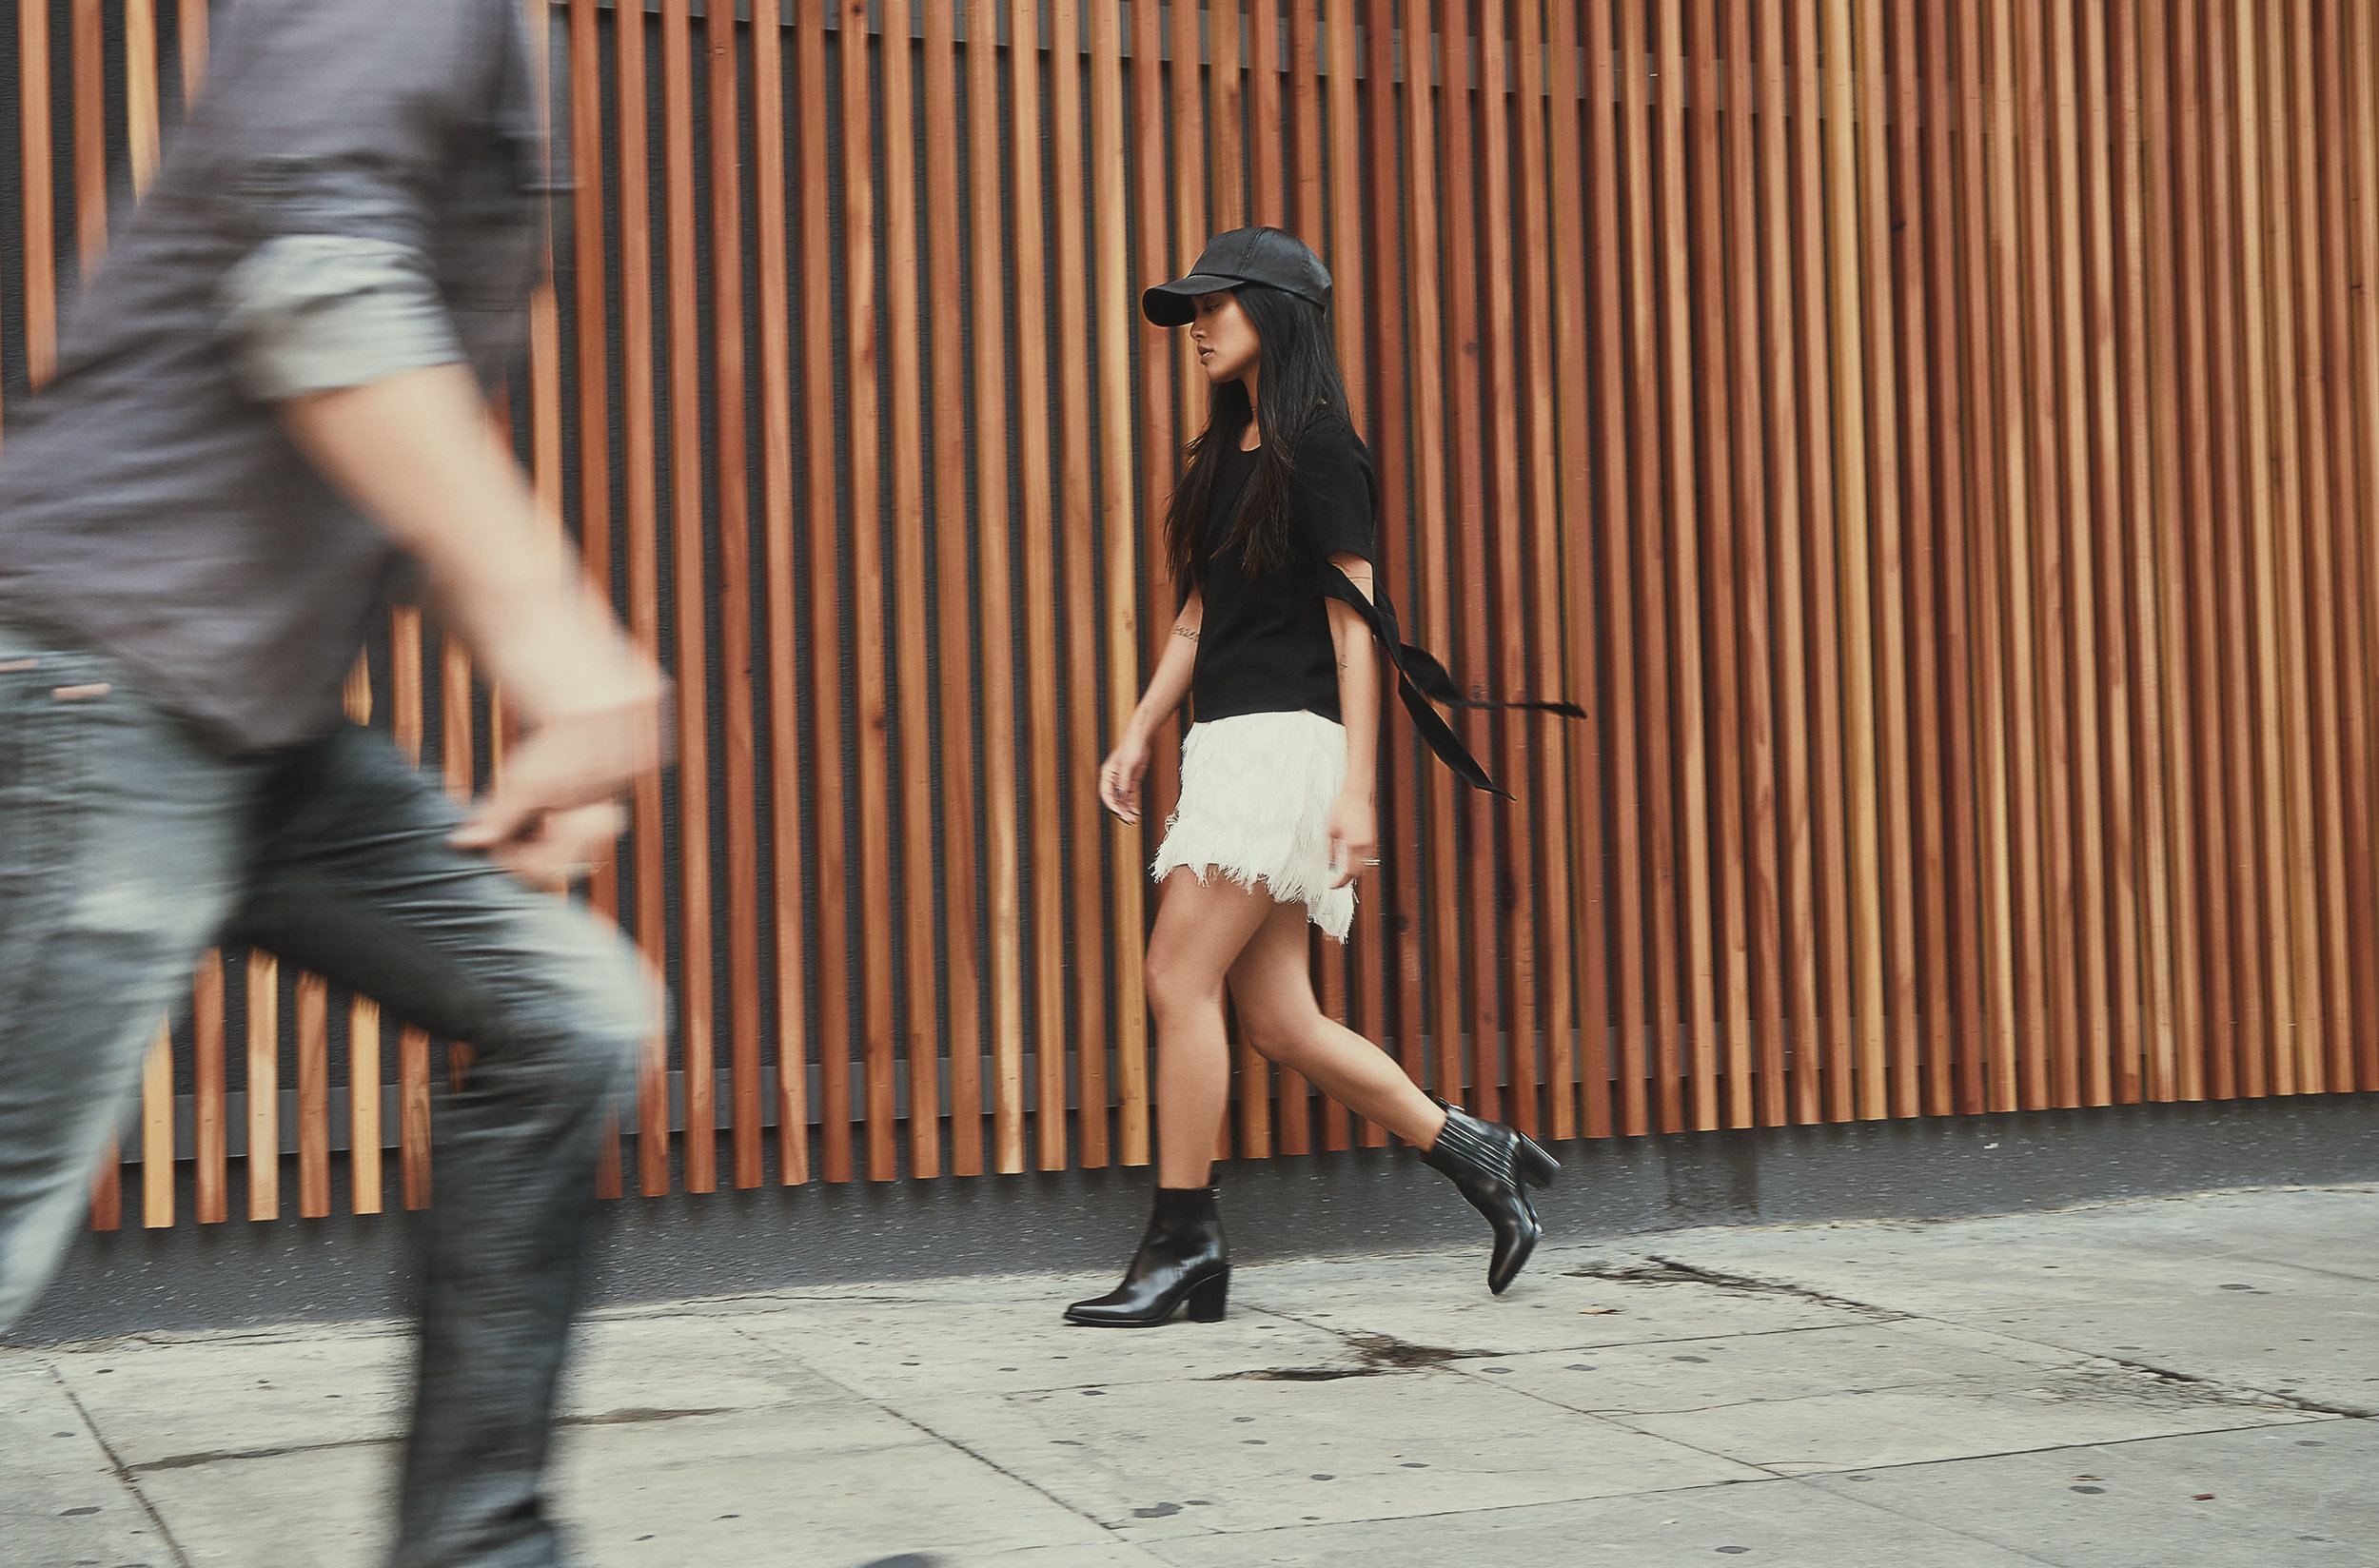 delphine top  |  art dept. skirt  |  sartore boots  |   photos by sean martin